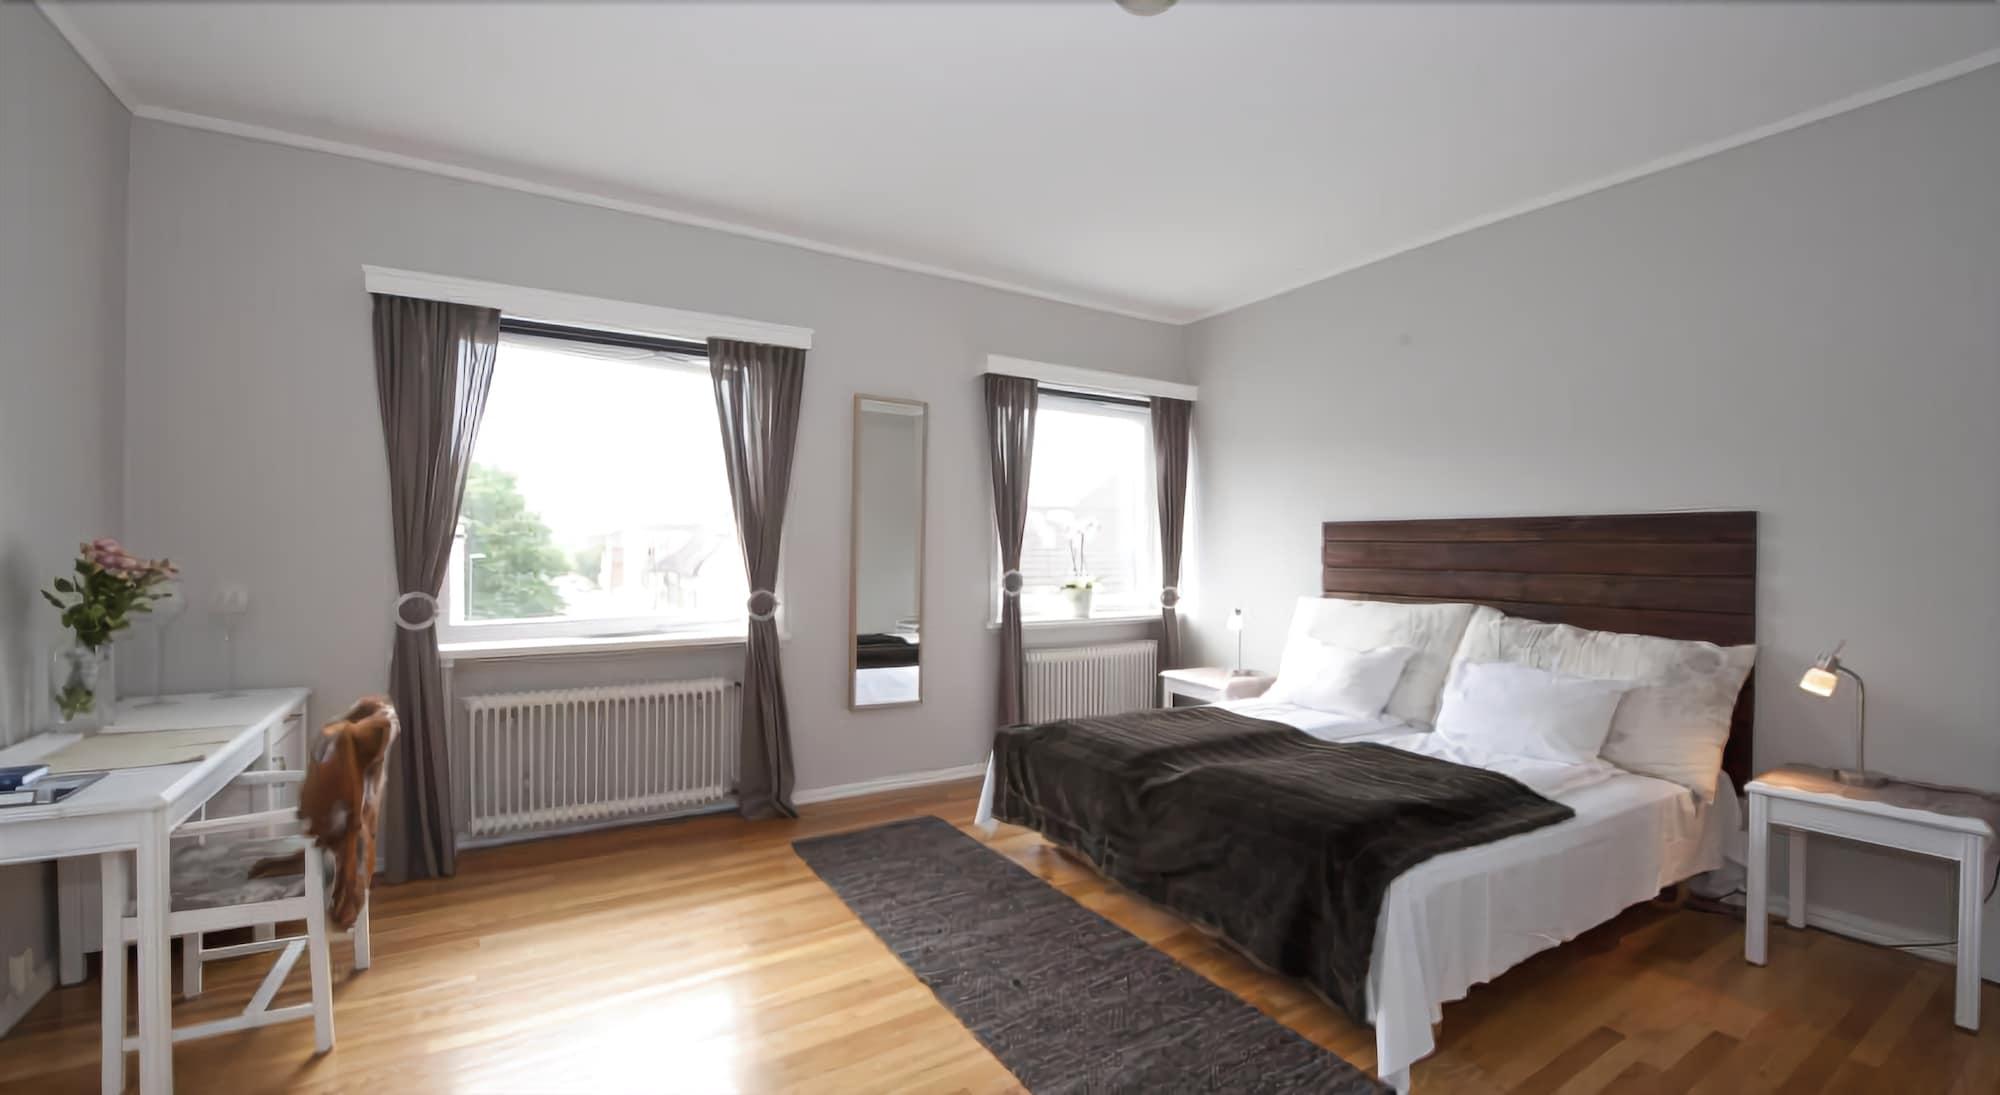 Hotell 1016 Olav Digre, Sarpsborg